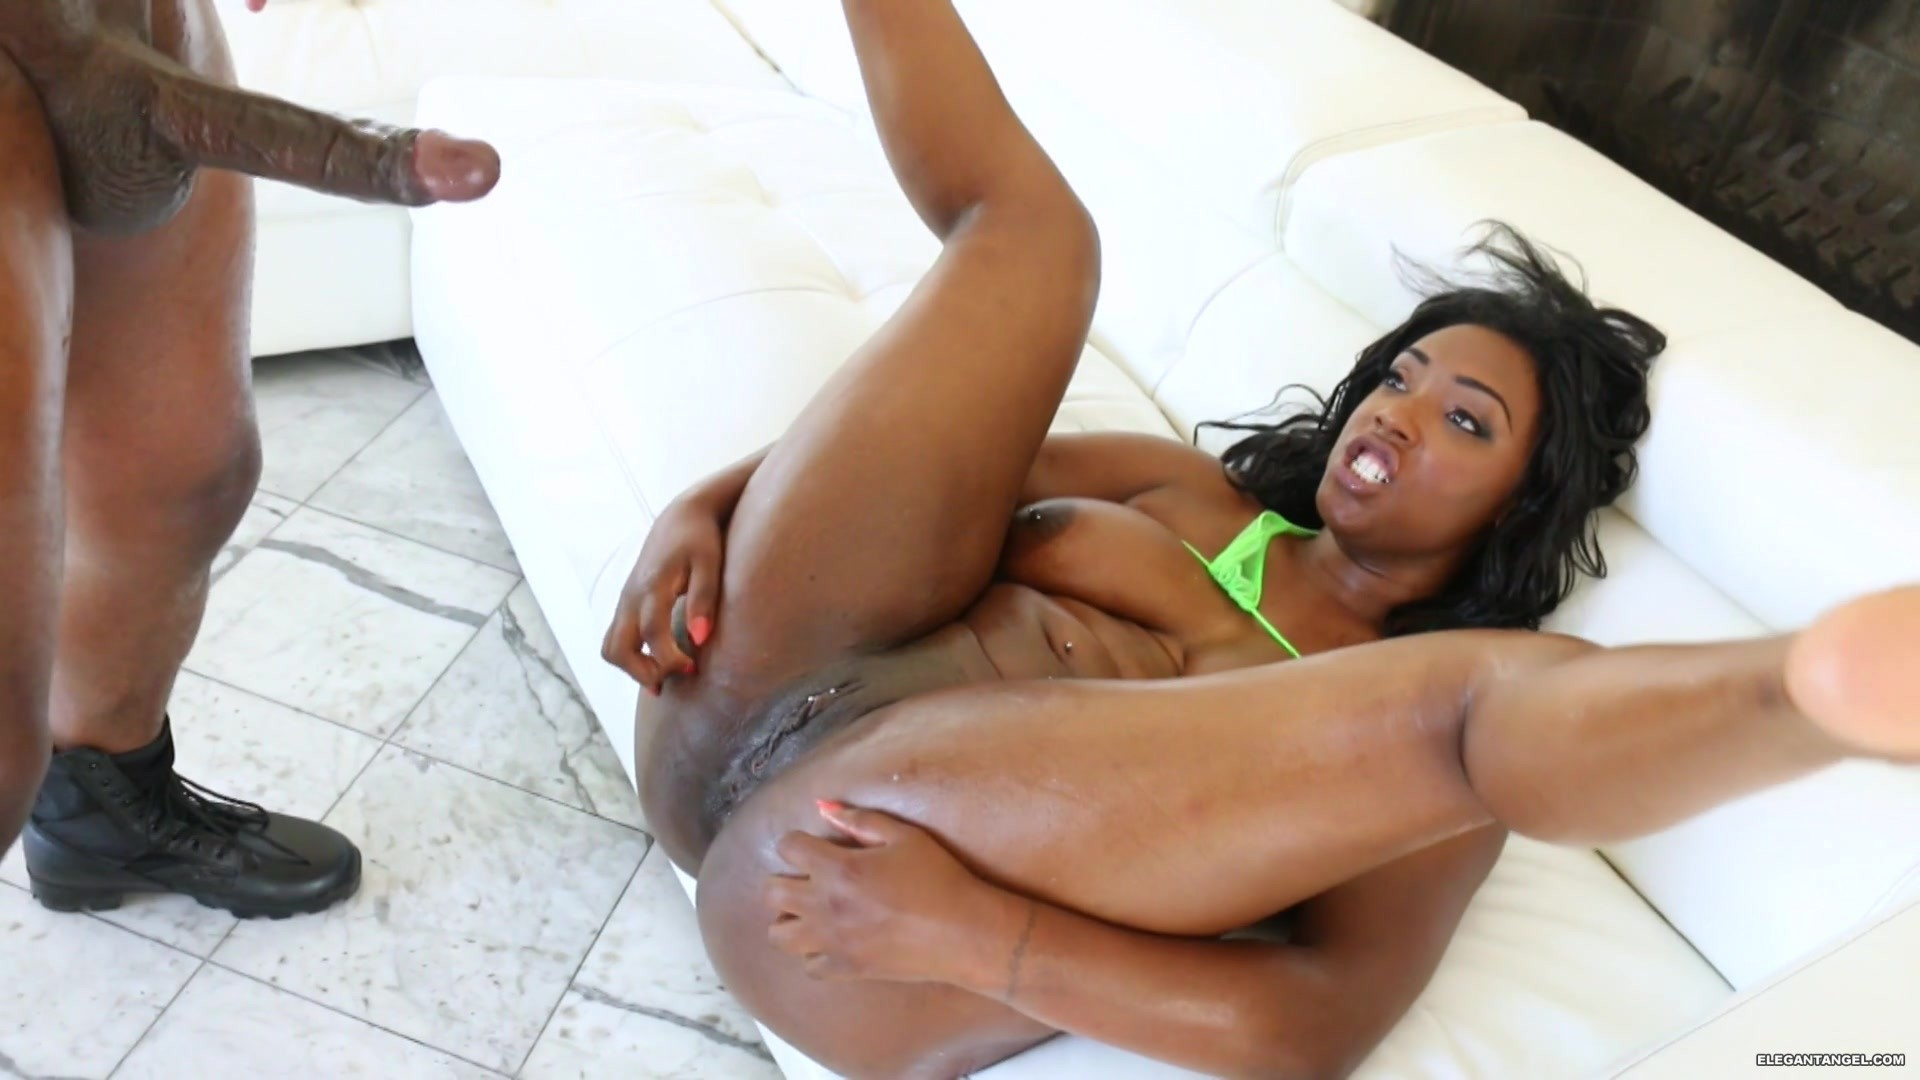 Huge black wet clitoris tits and